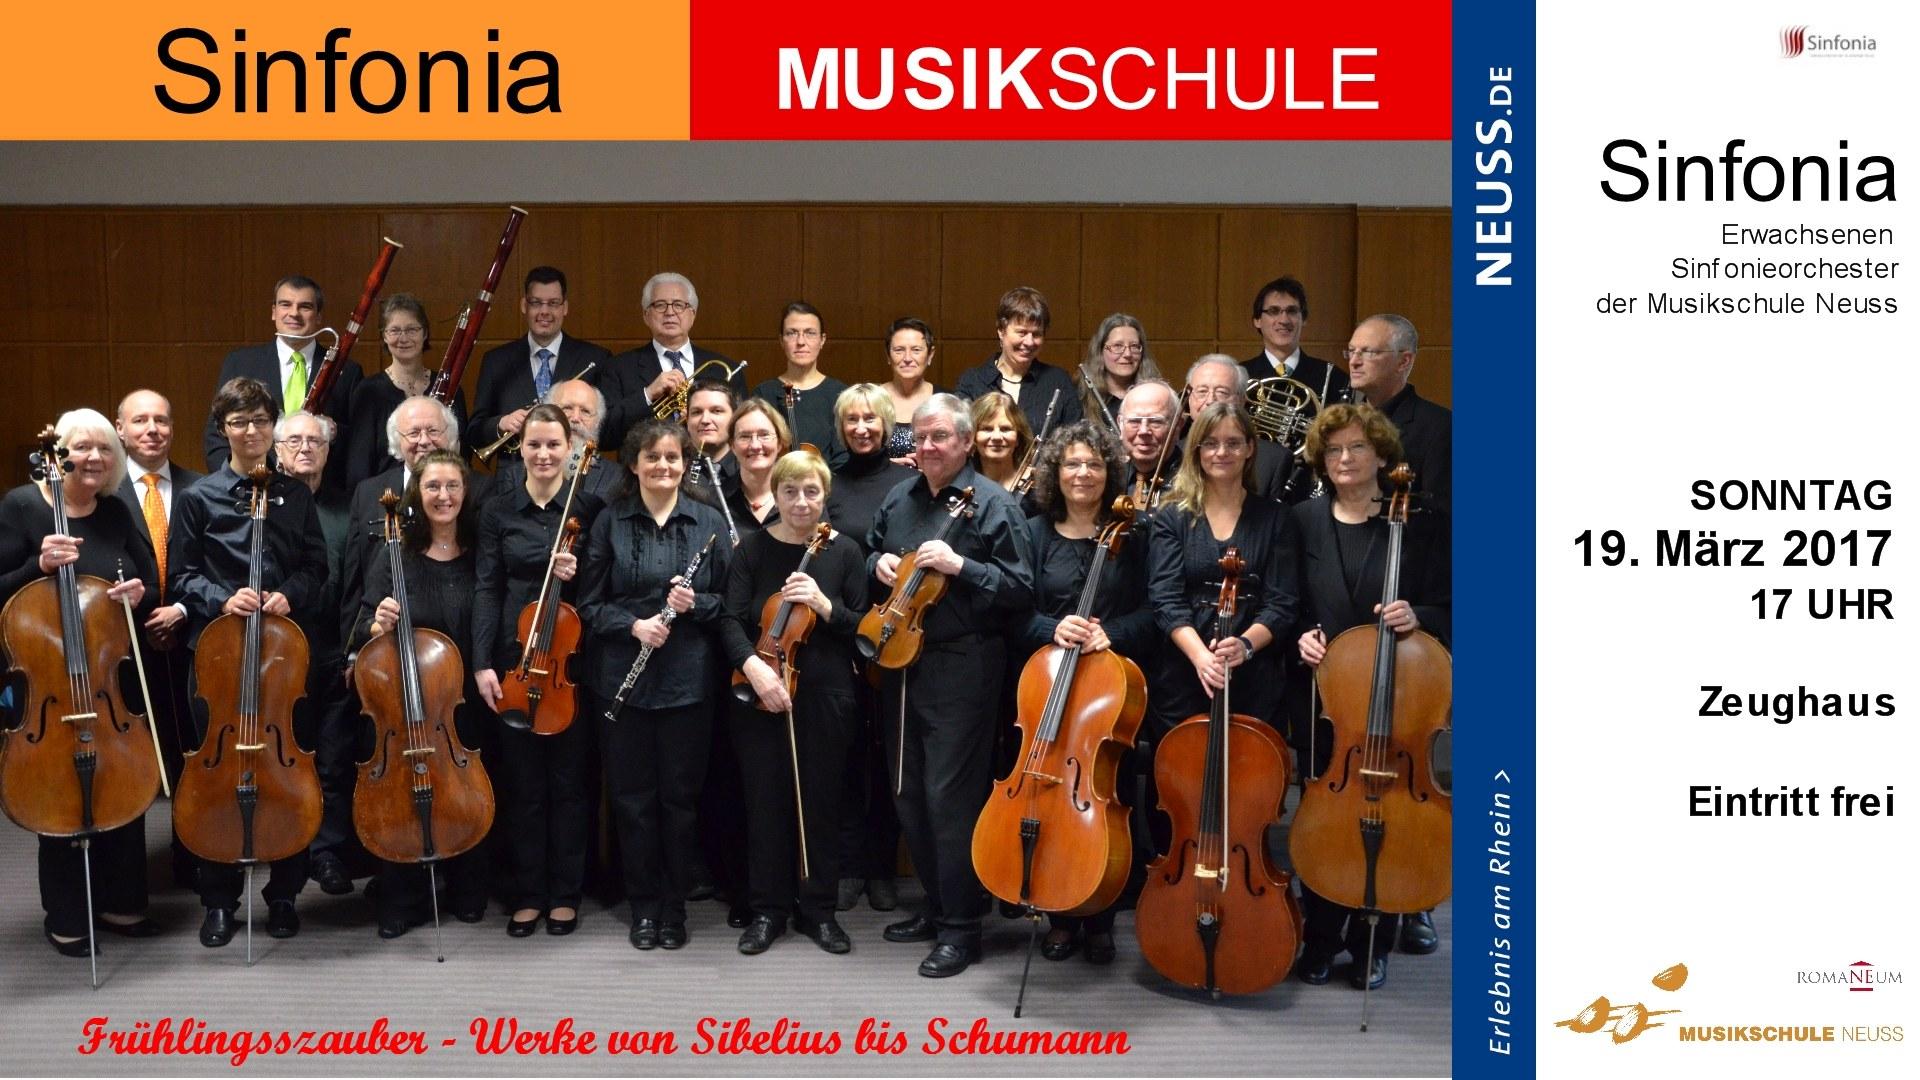 Sinfonia19.3.17 .jpg